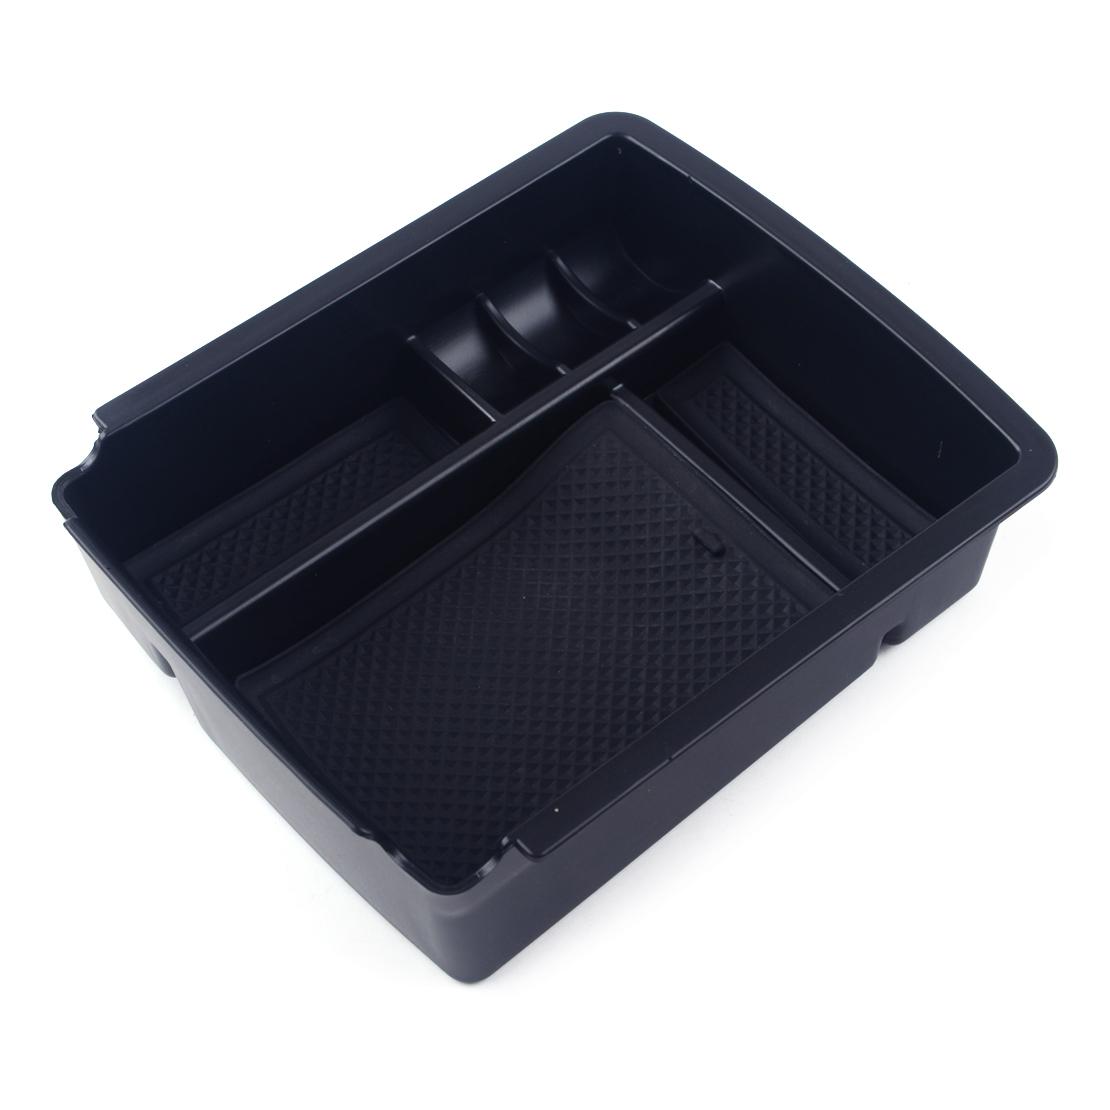 Interior Center Console Armrest Storage Tray Holder Fit for VW Golf 7 MK7 14-18